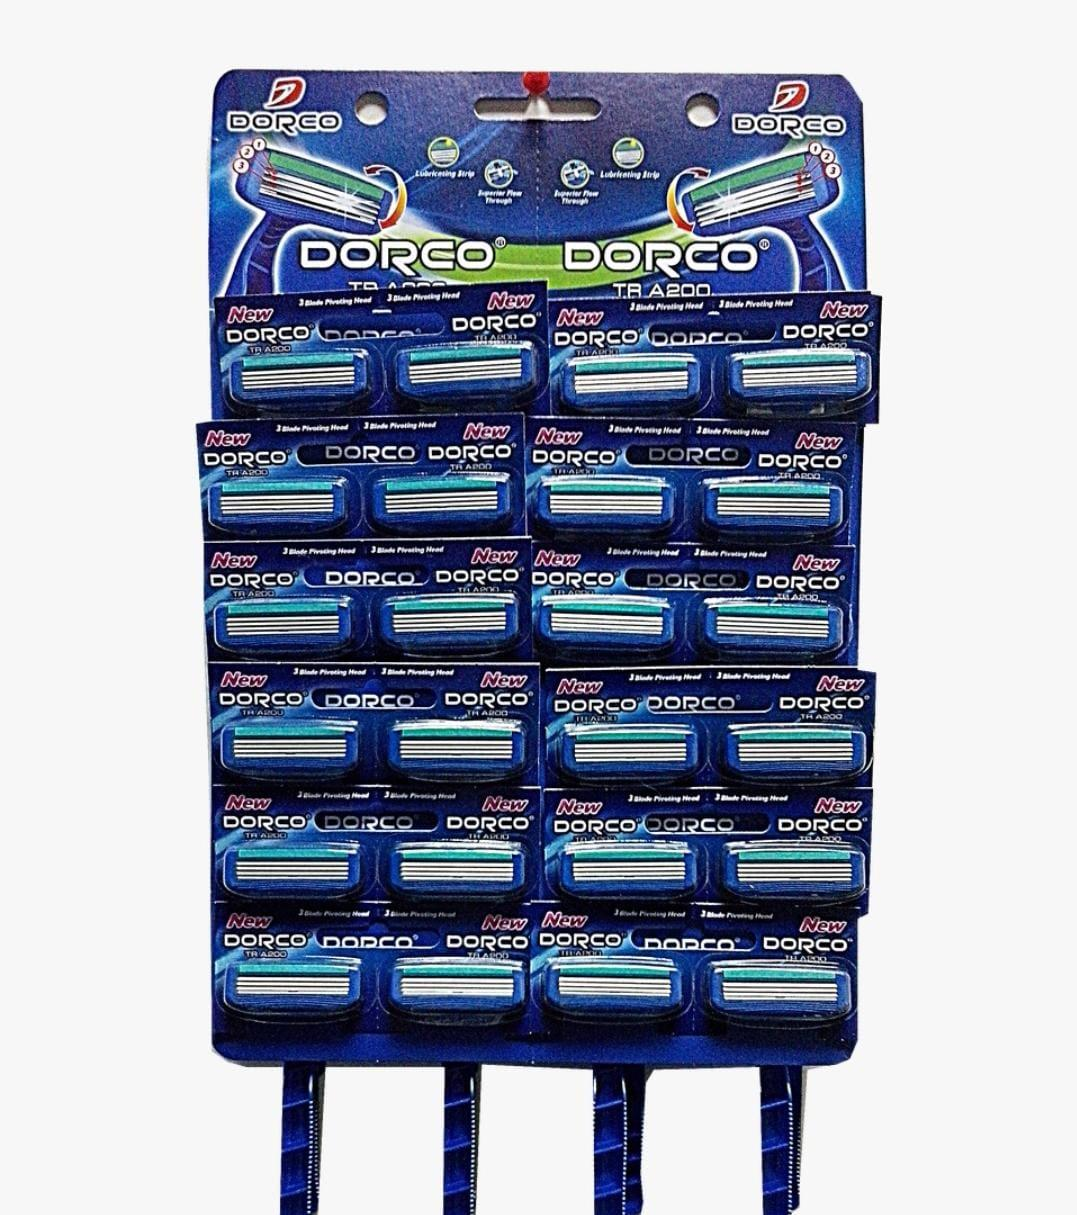 Dorko станки для бритья 3лез со смаз. На планшете